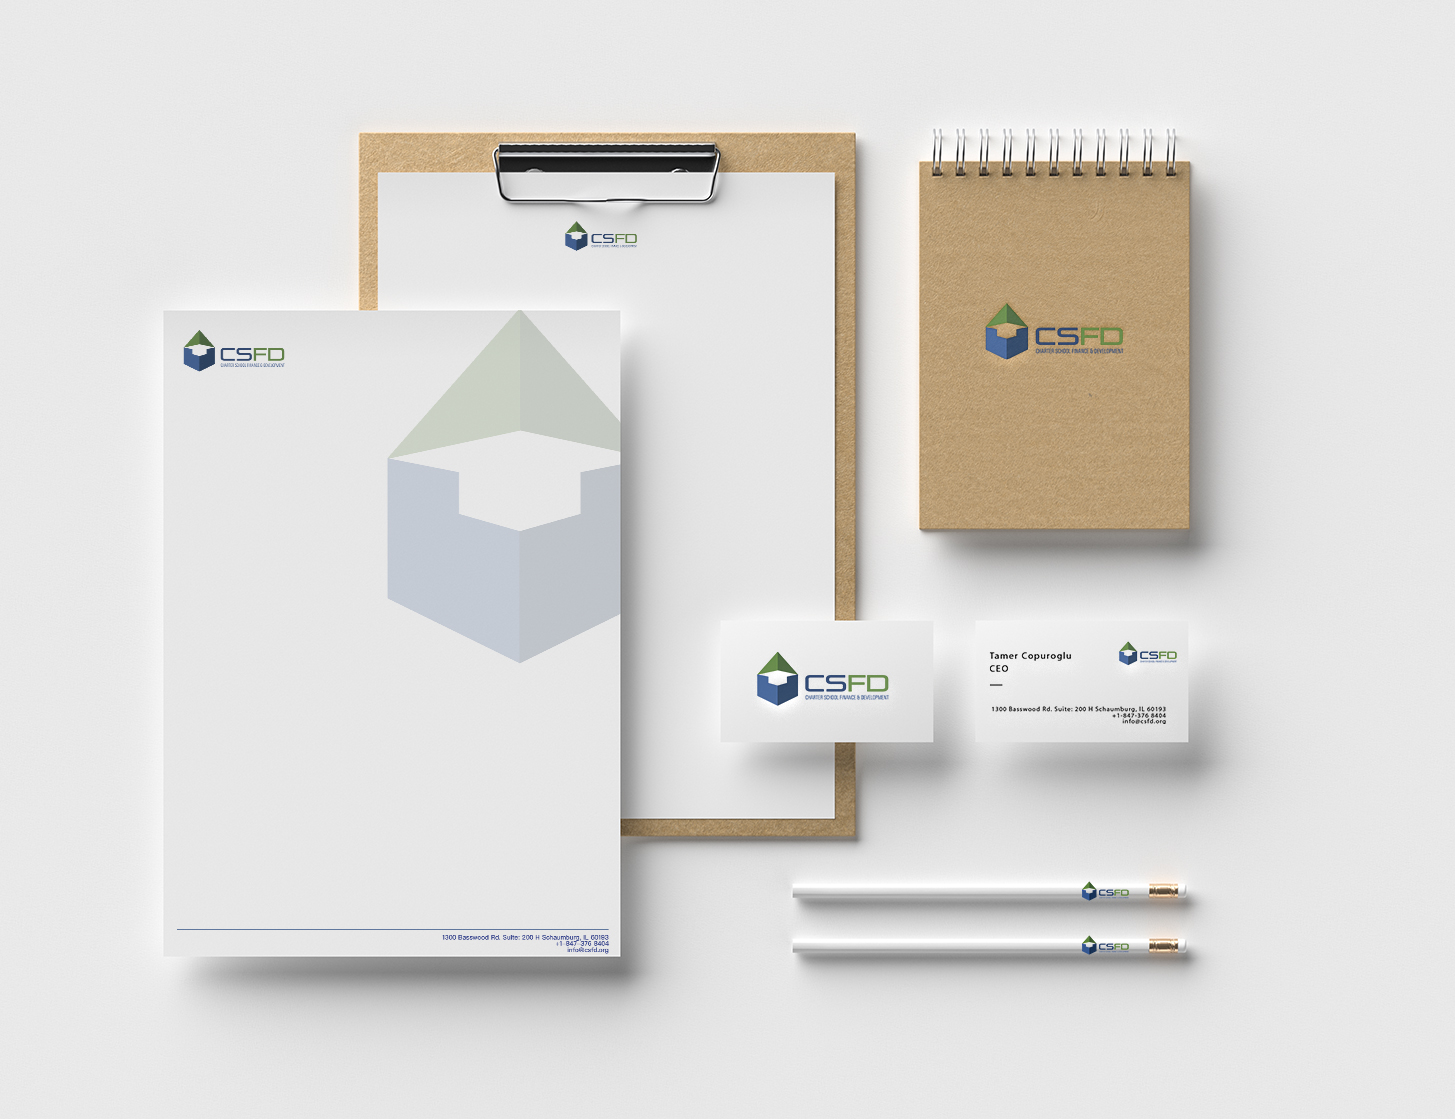 csfd-branding